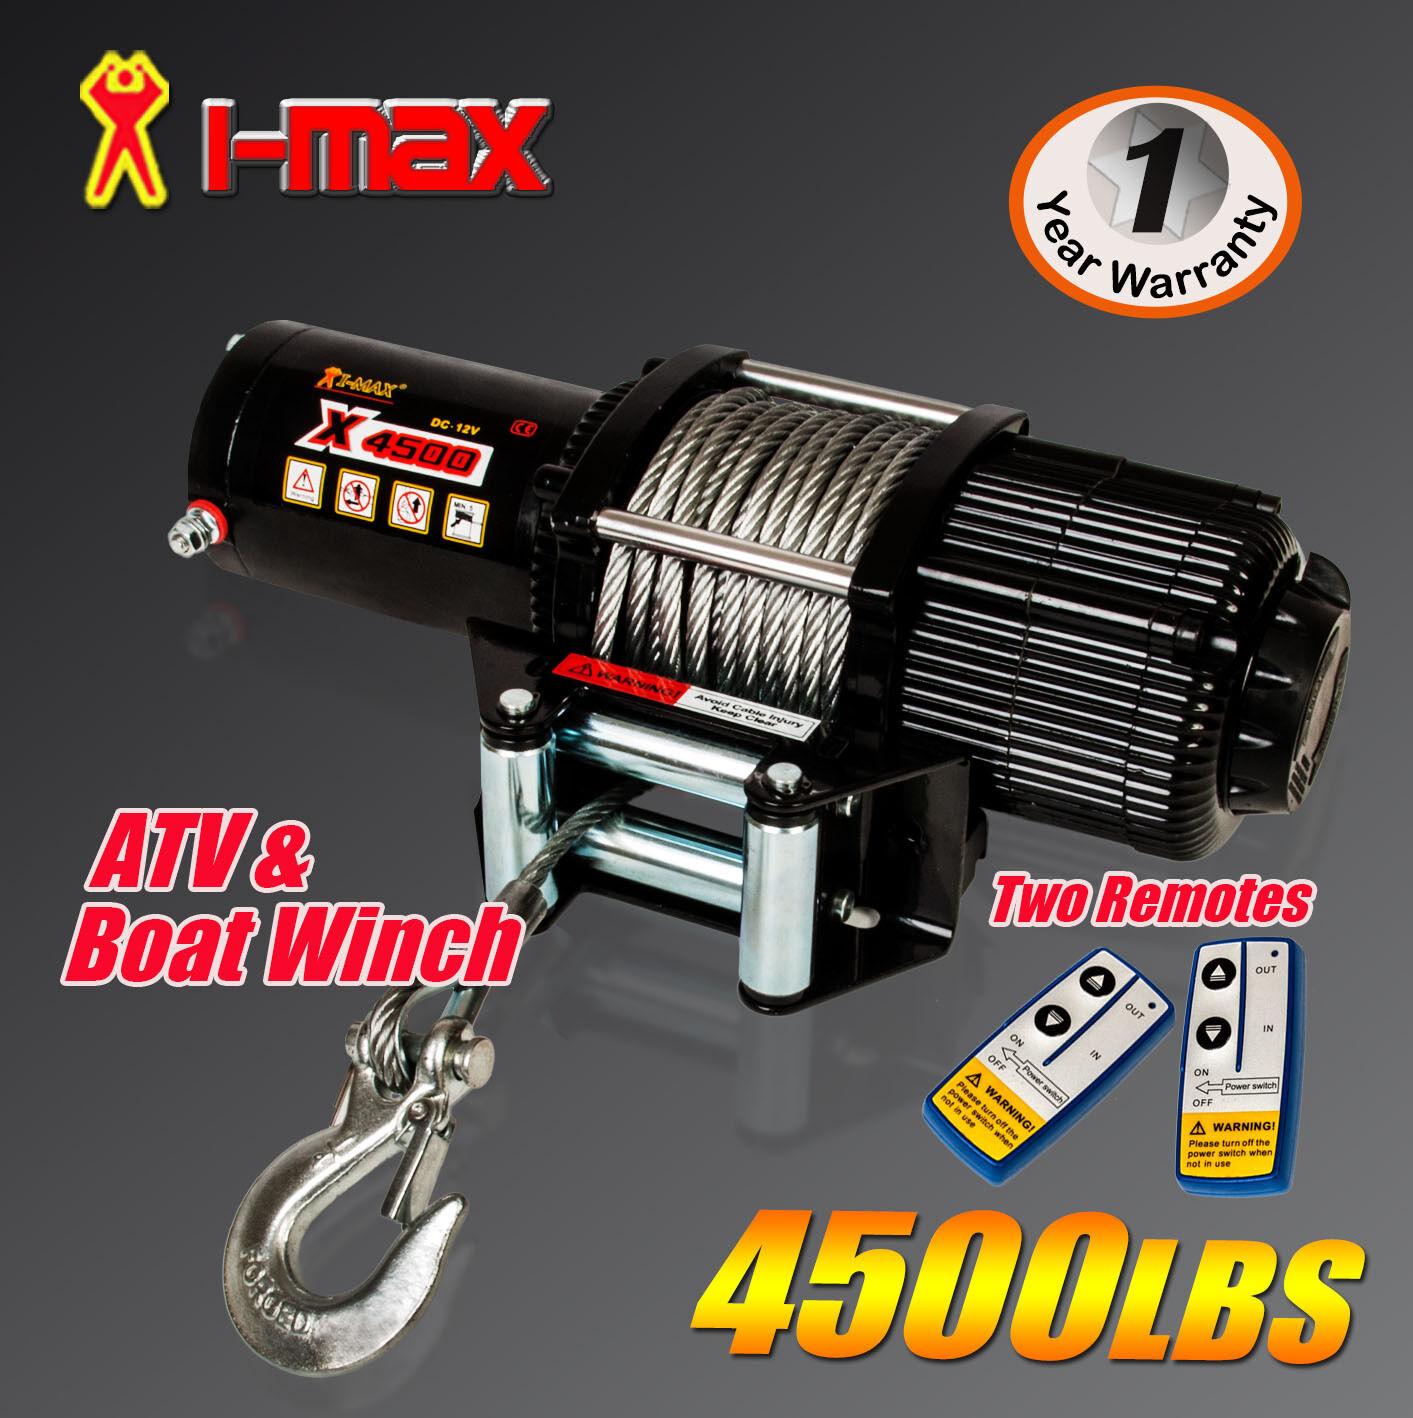 Imax Winch Wiring Diagram 12v Schematics 12 Volt Electric I Max Wireless 4500lbs 2041kgs Atv 4wd 4x4 Boat Solenoid